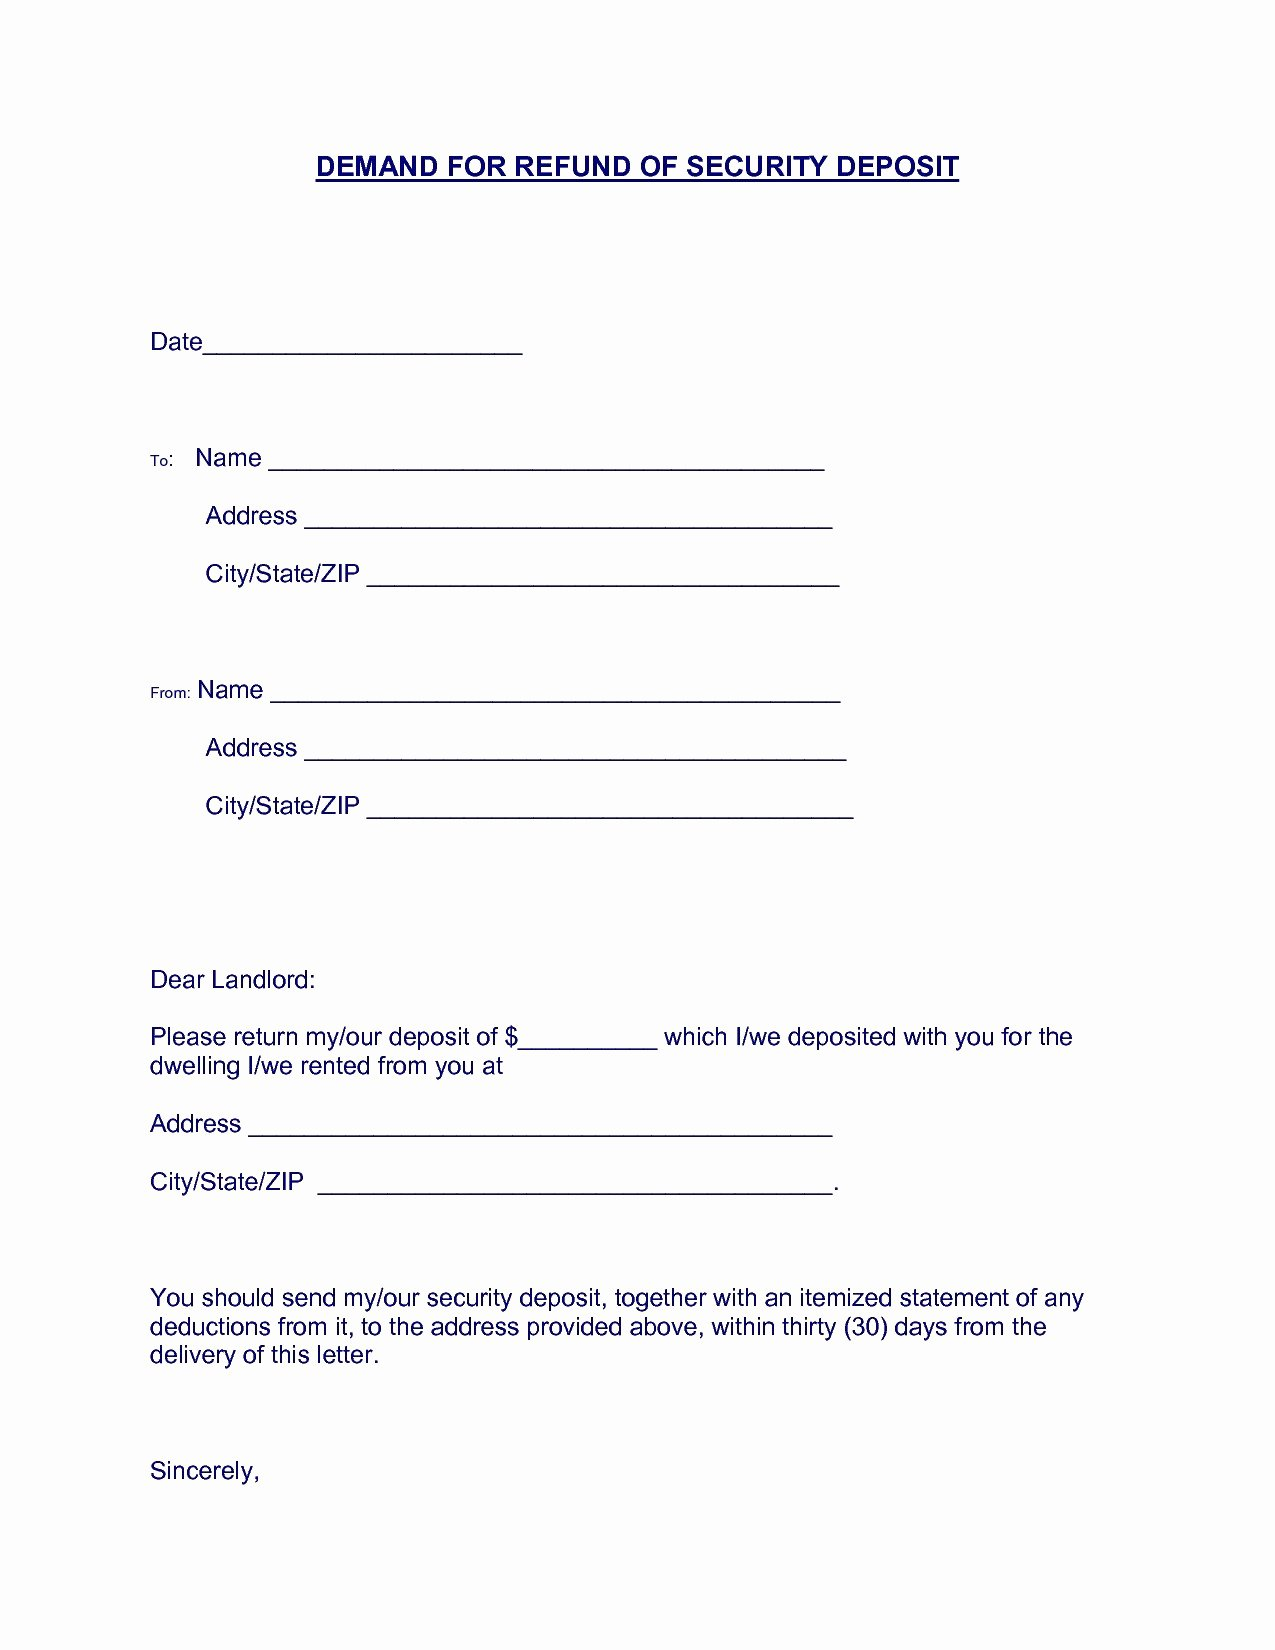 Security Deposit Letter format Elegant Security Deposit Demand Letter Template Florida Collection